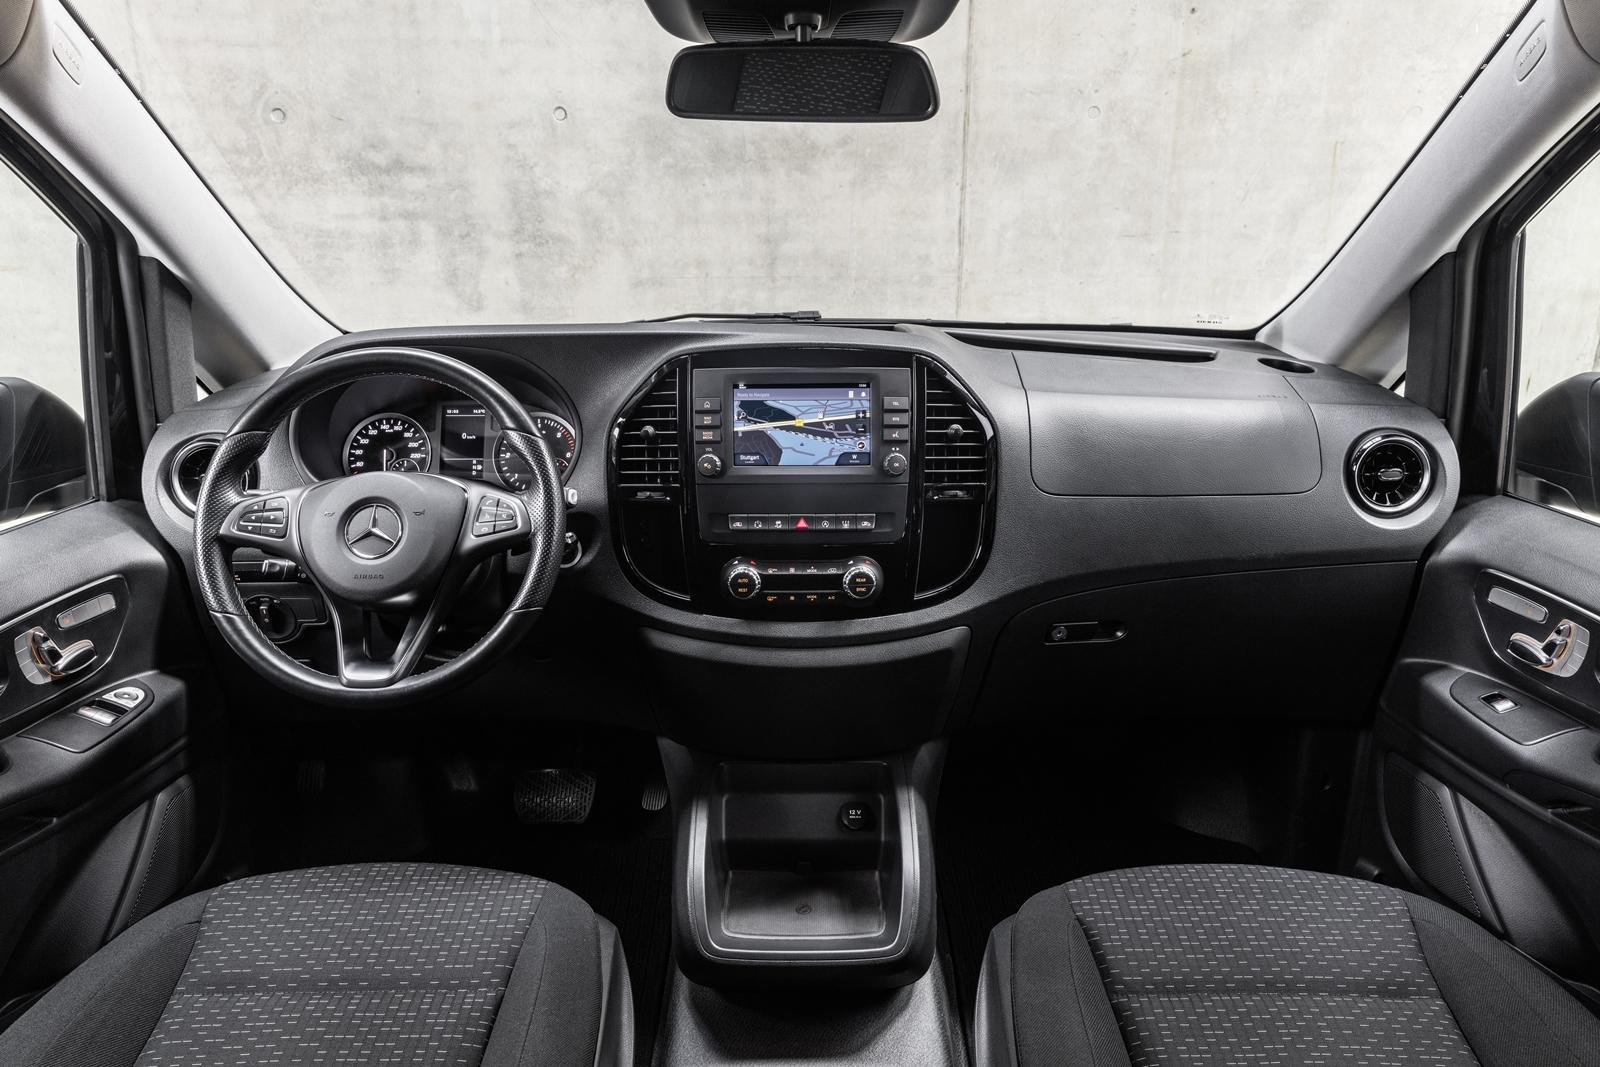 Mercedes Benz Vito 2020 (16)